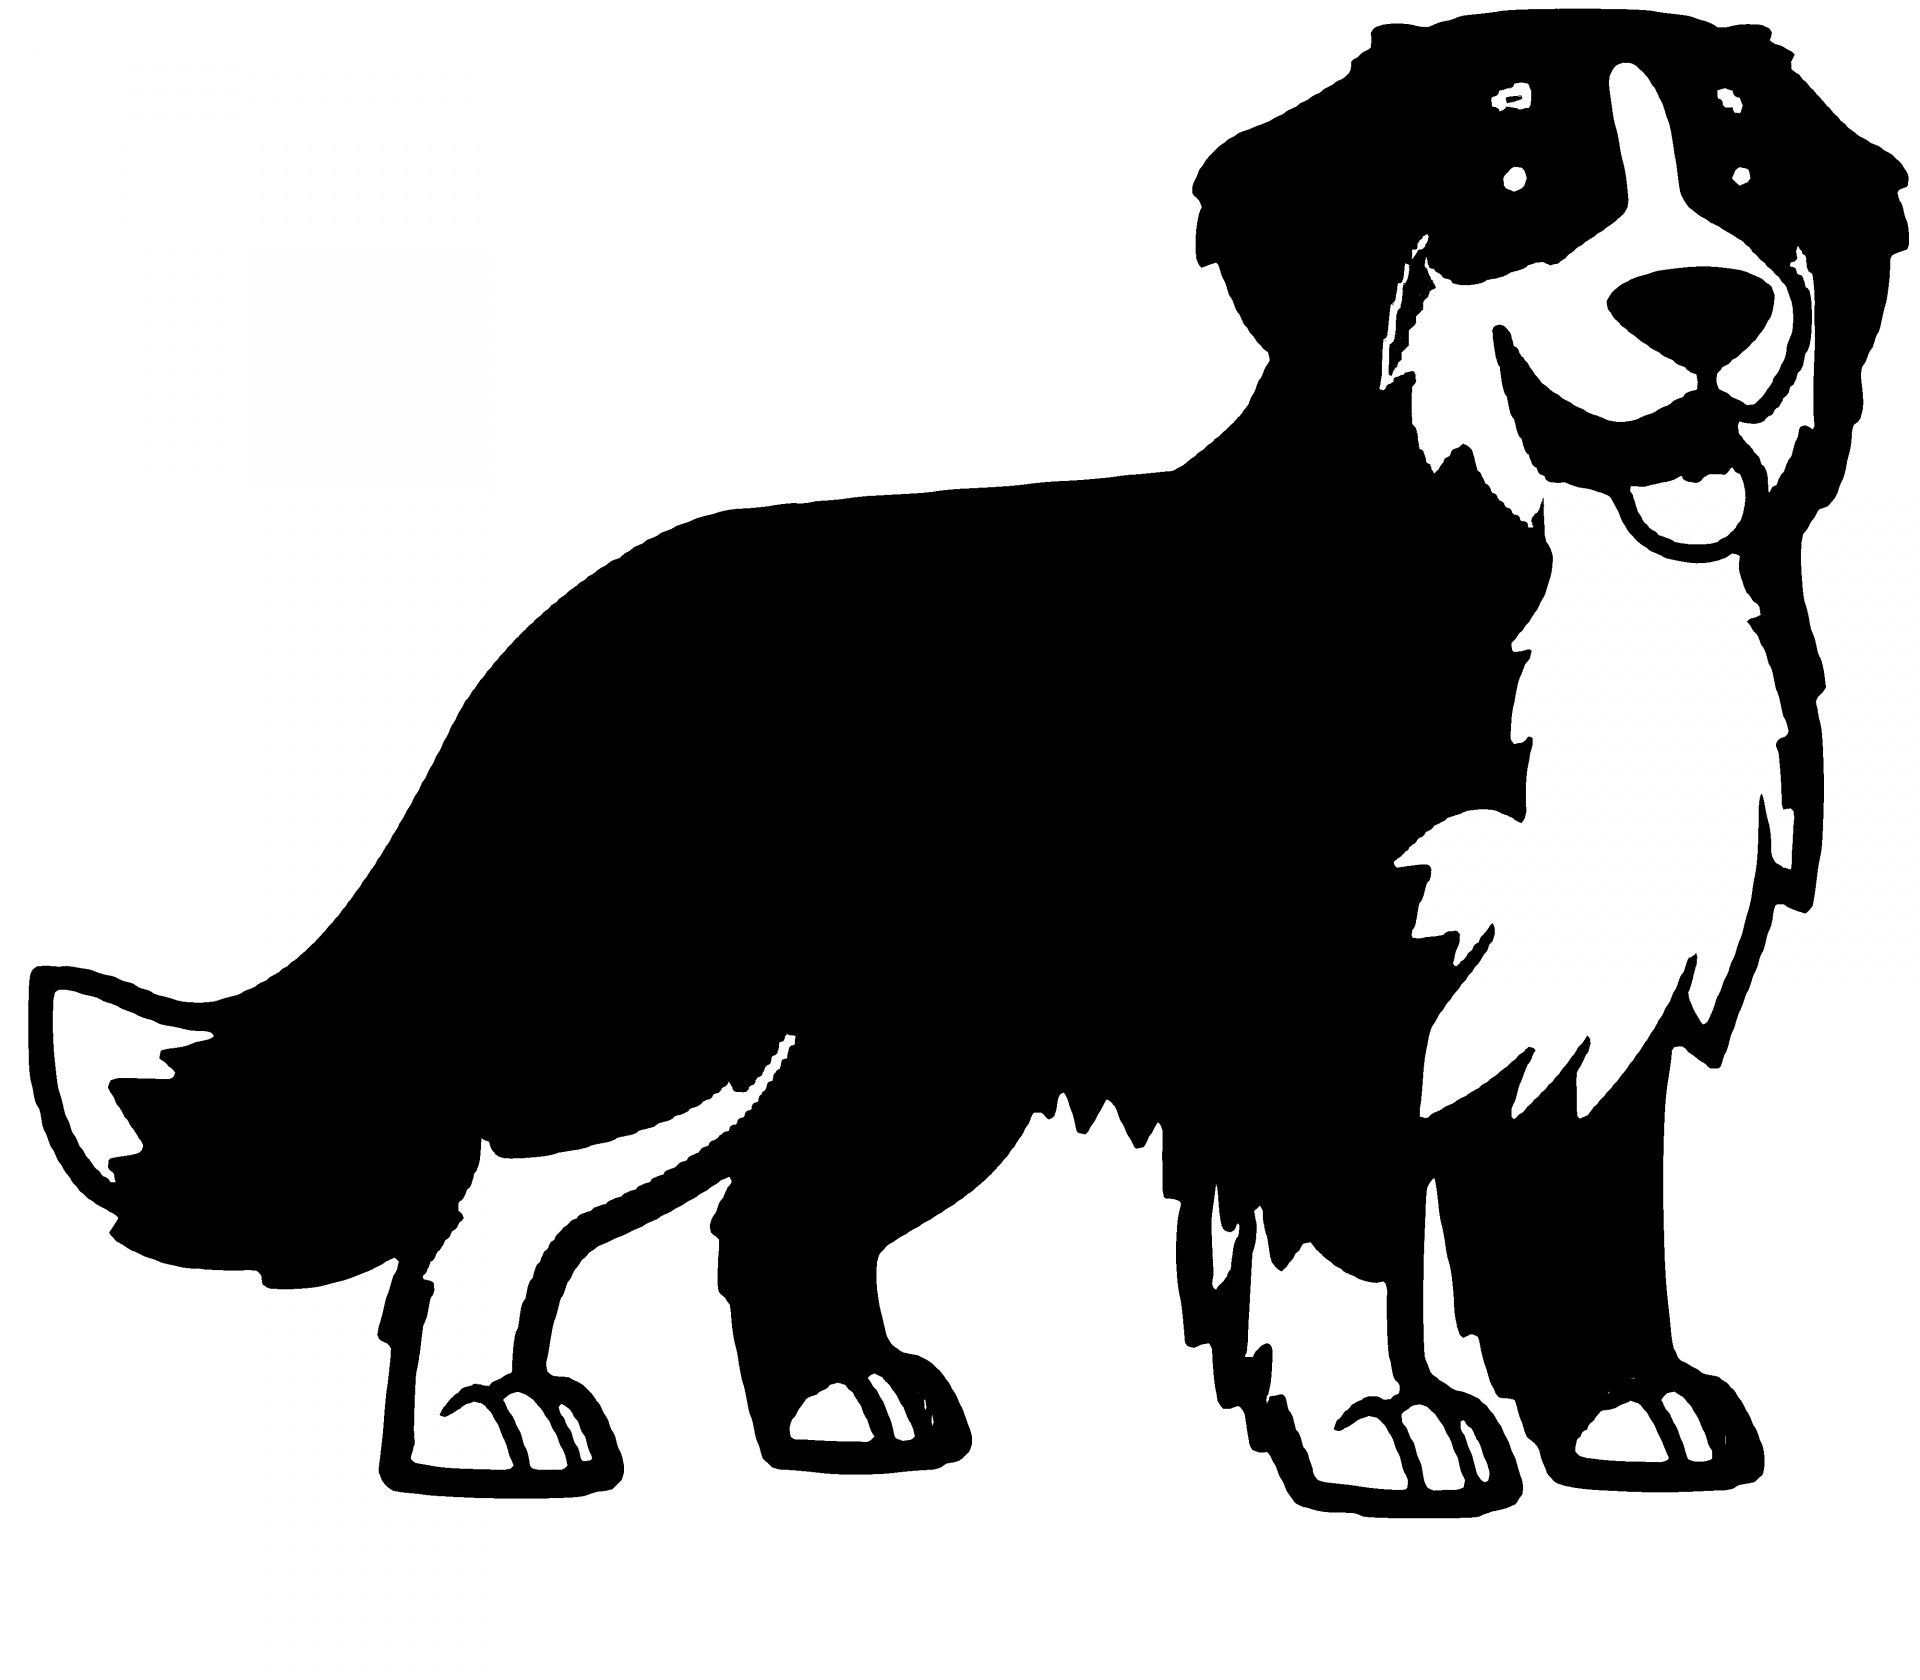 Mountain Dog | Dog stencil, Mountain dogs, Dog outline